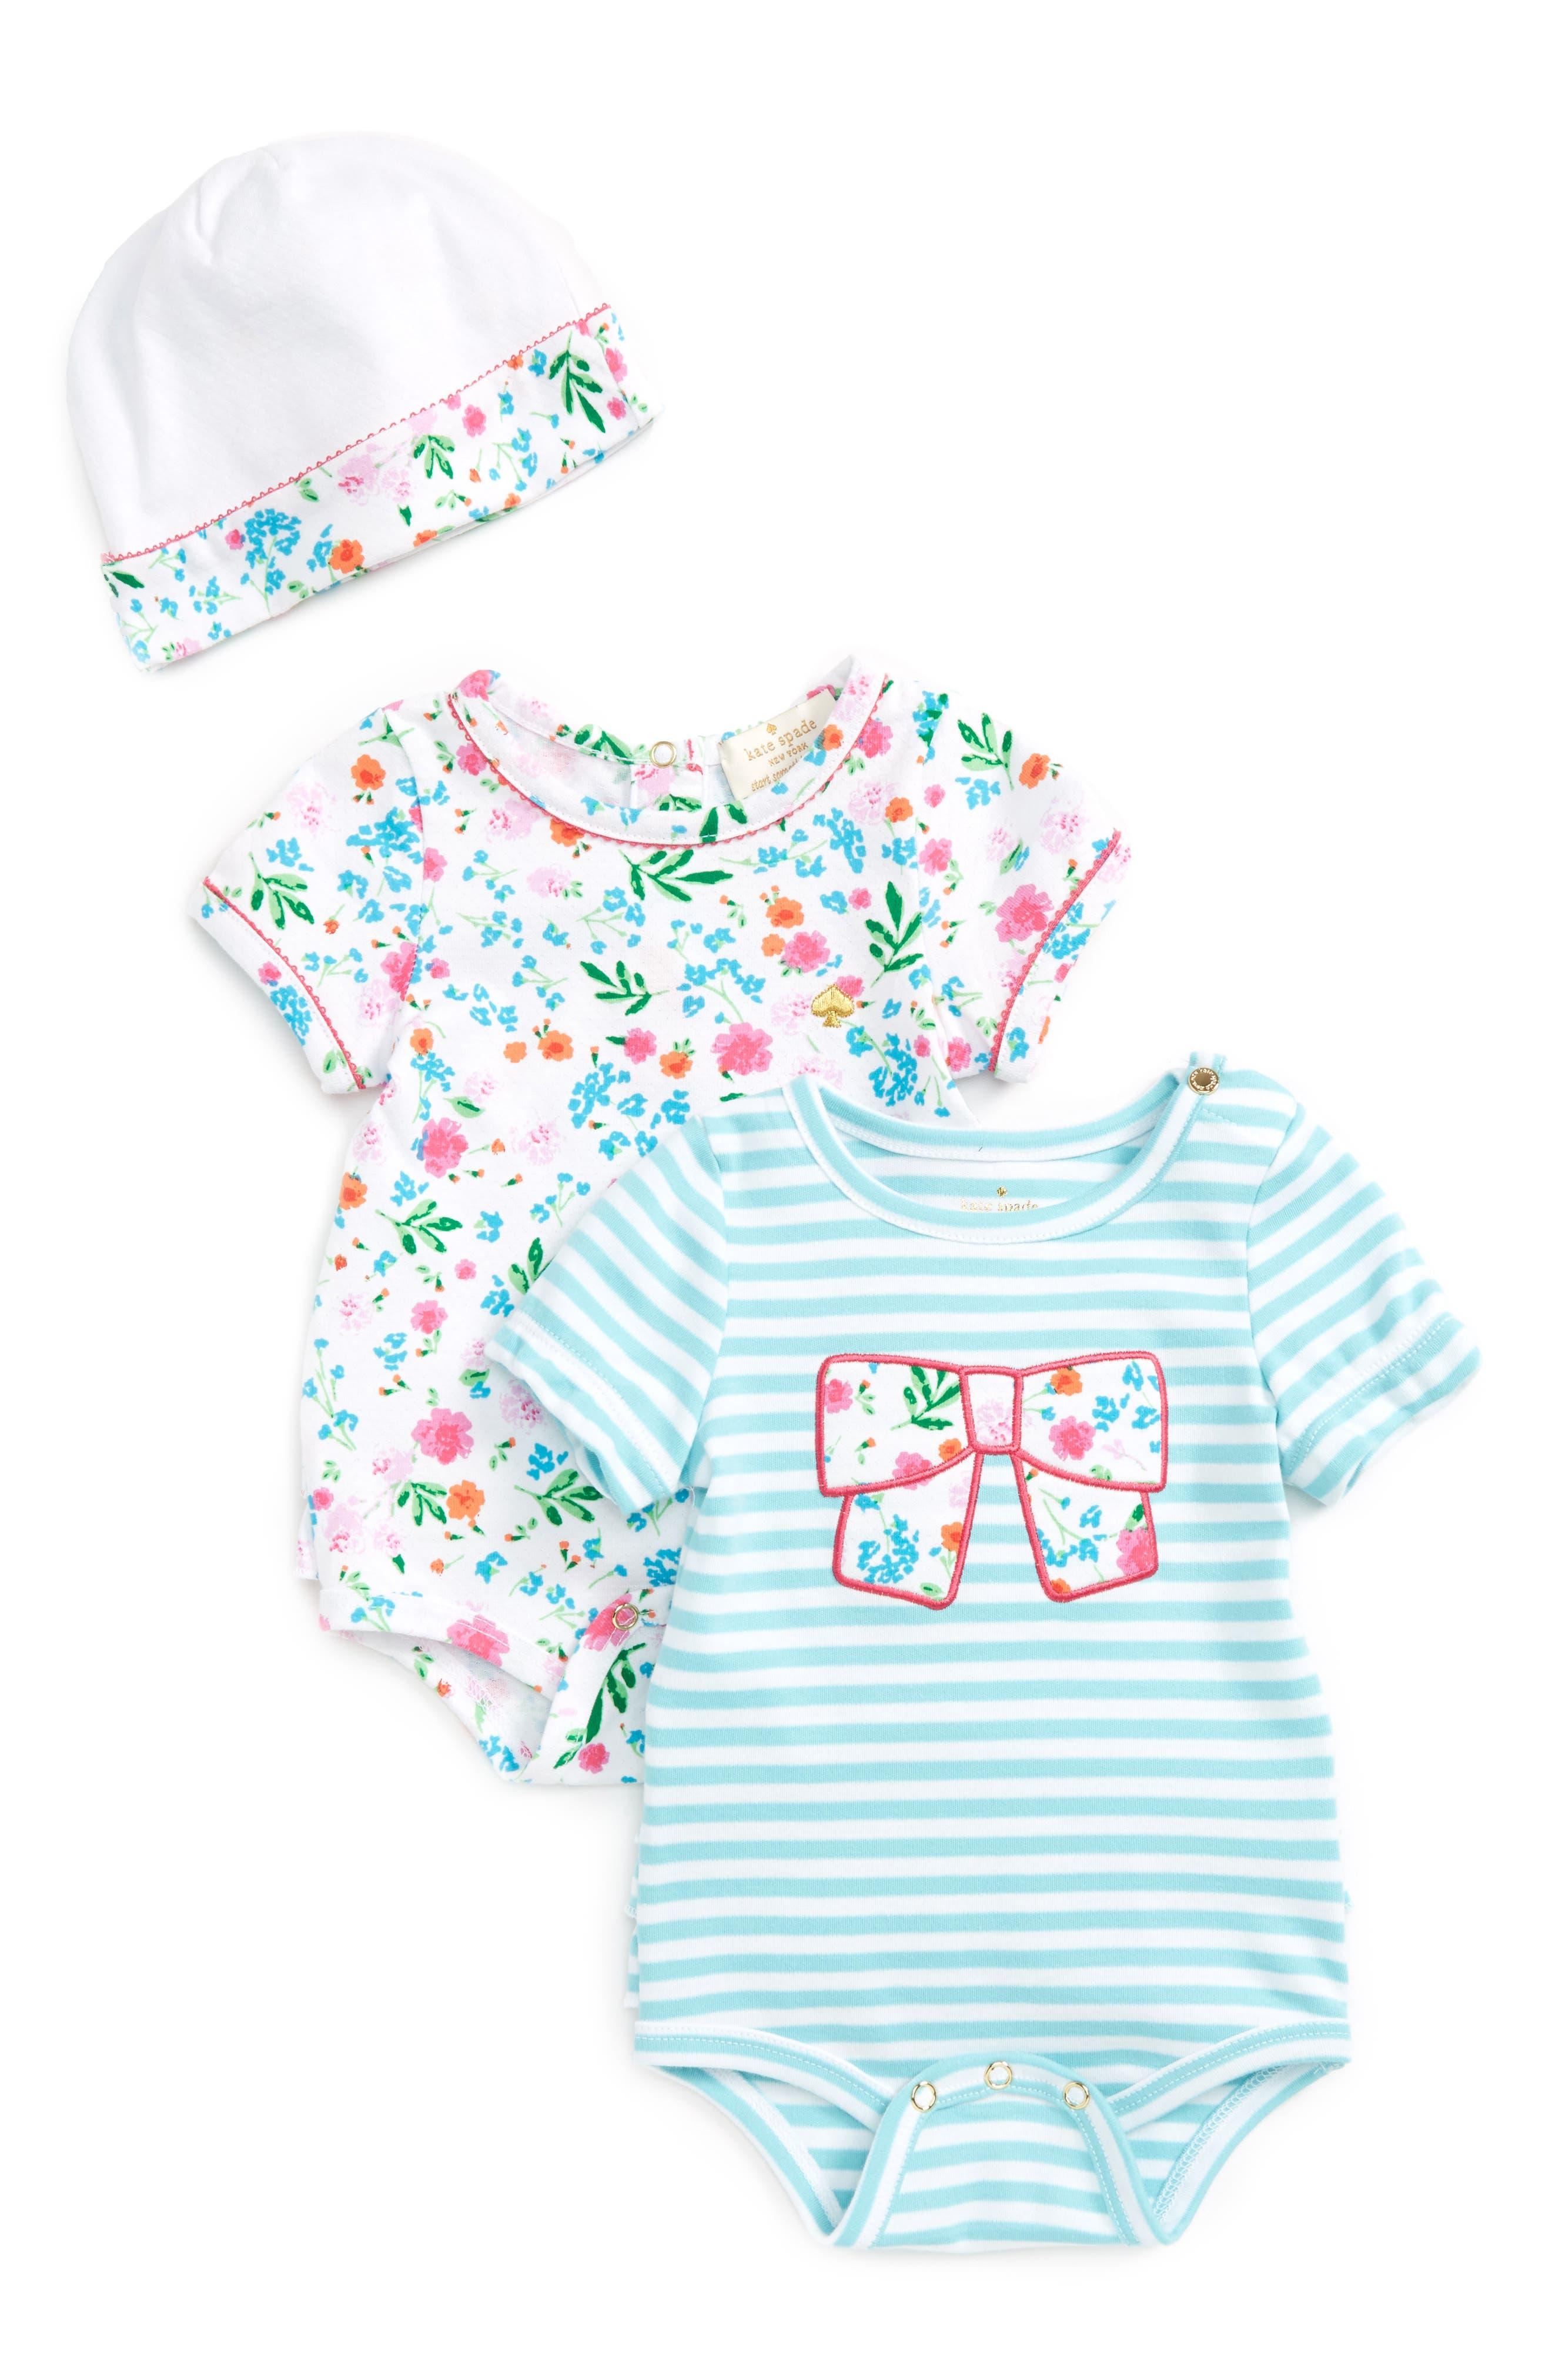 kate spade new york 2-pack bodysuits & cap set (Baby Girls)